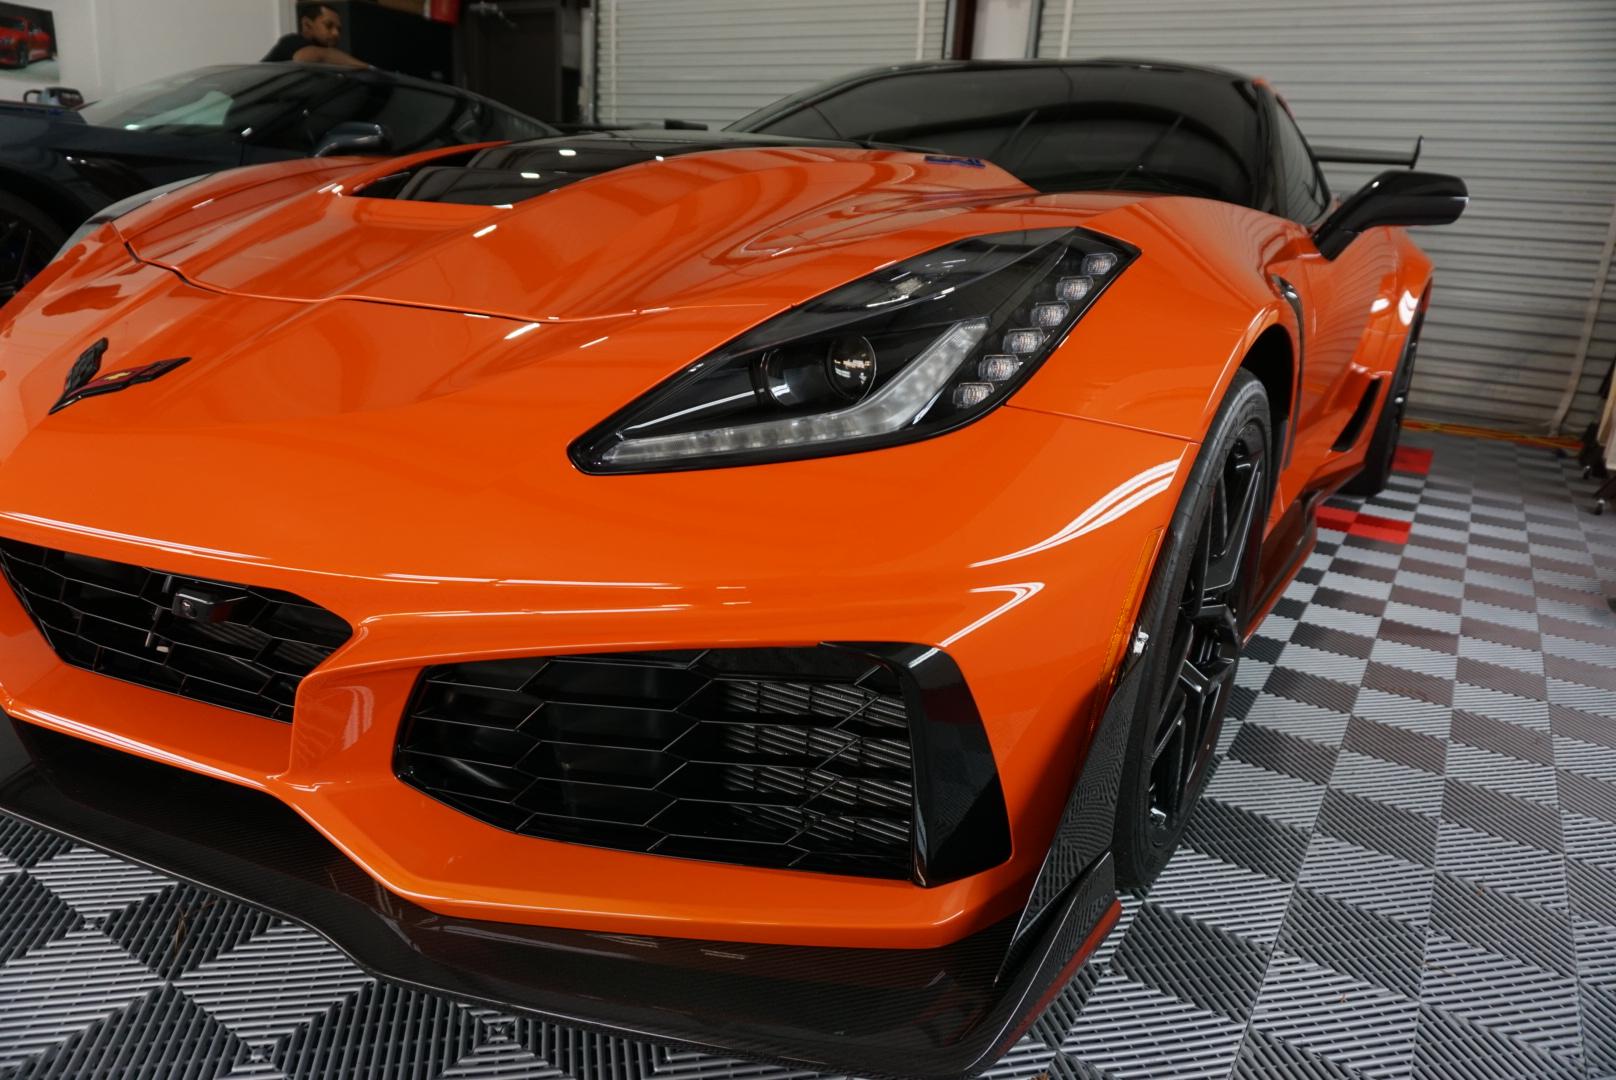 Photo of an Orange 2019 Chevrolet Corvette